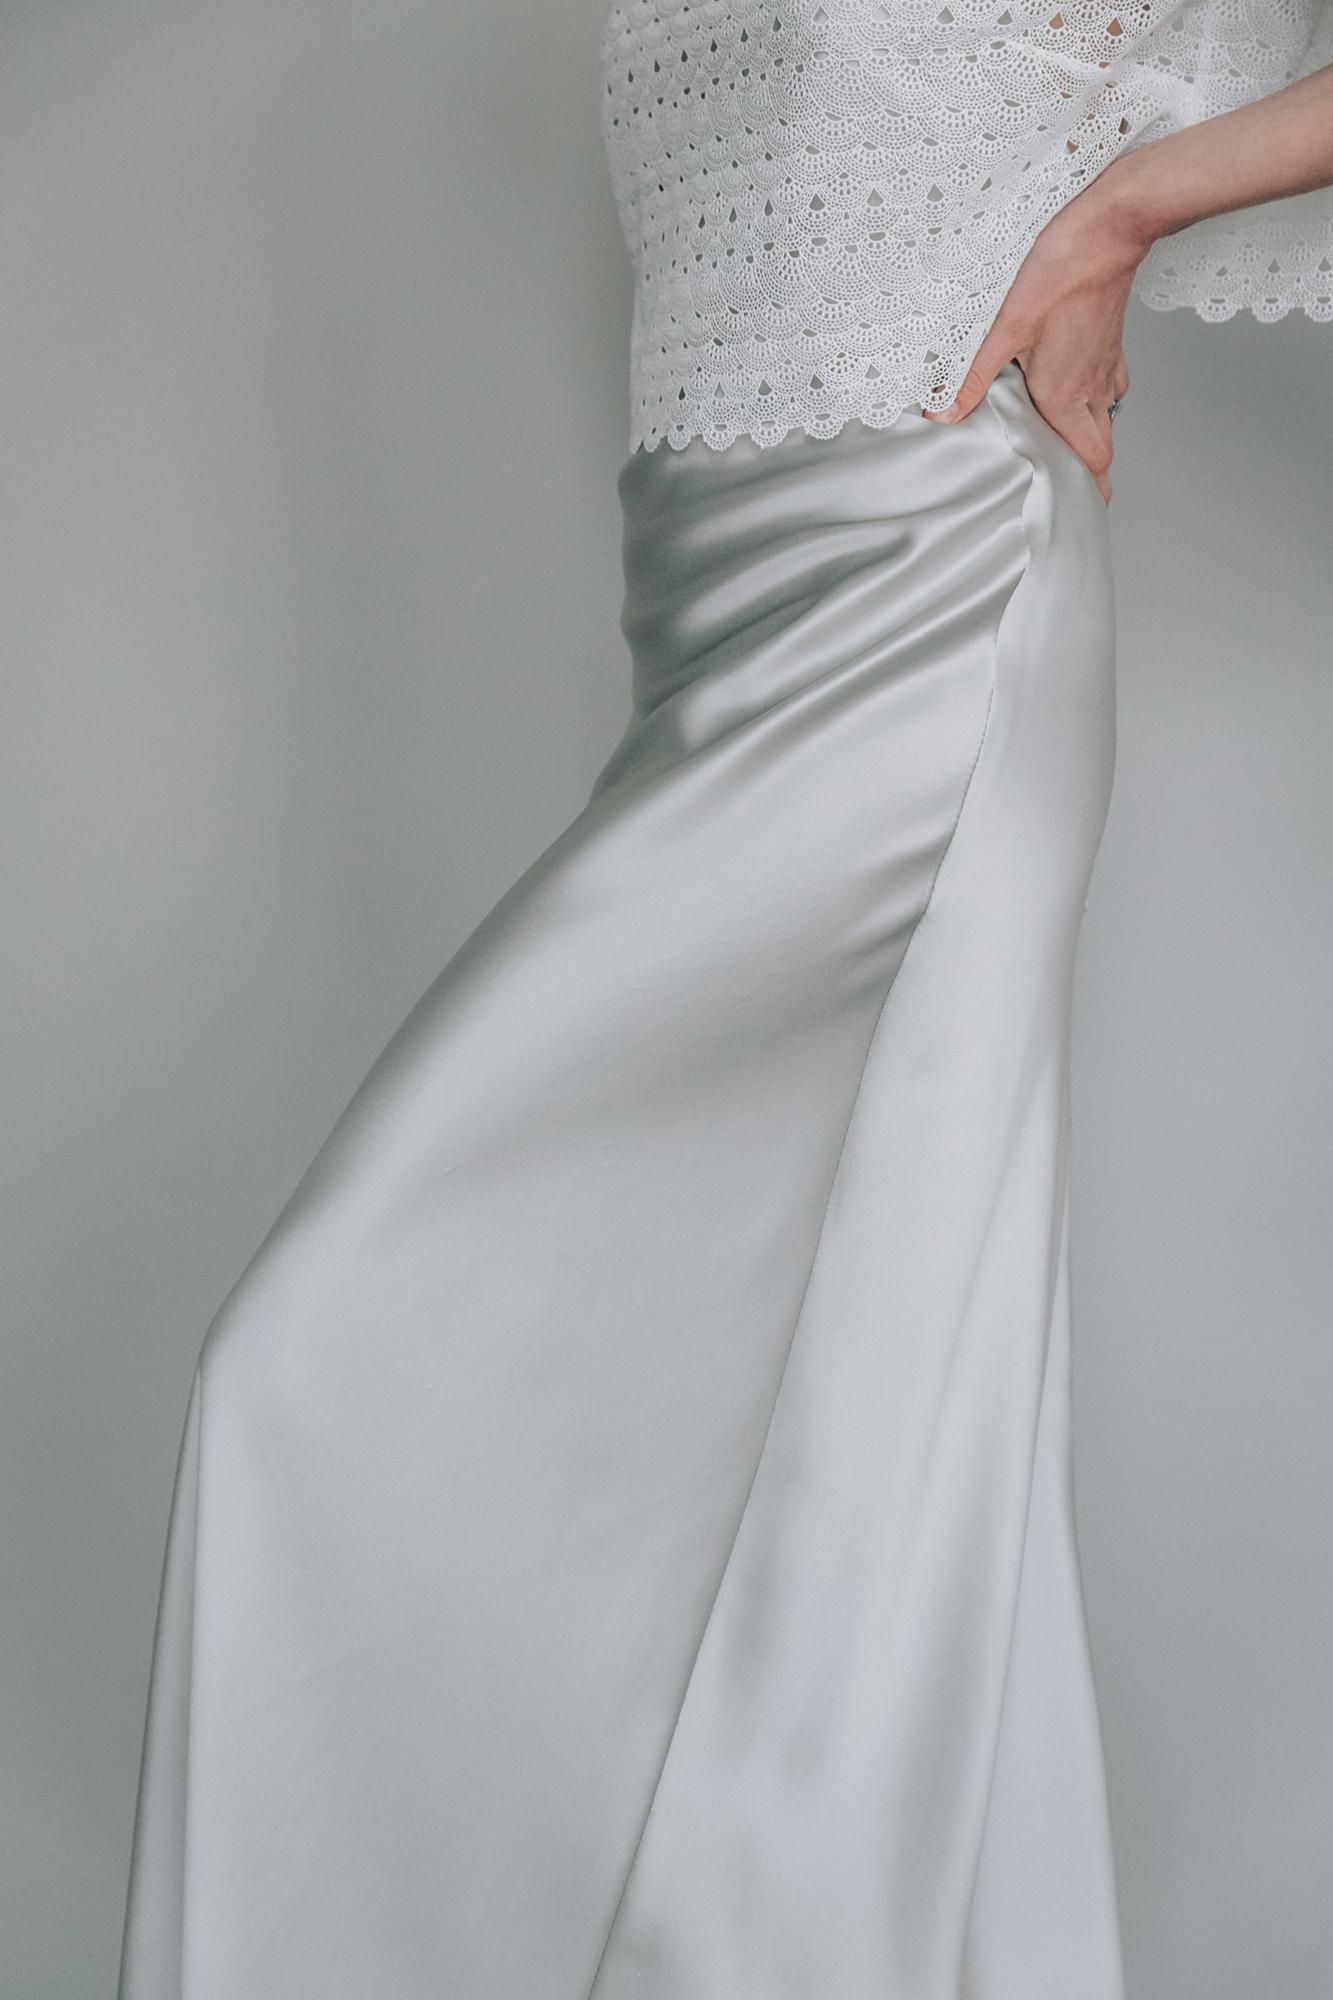 Kate-Beaumont-Sheffield-Freesia-Guipure-Lace-Jacket-Cosmos-Bias-Cut-Silver-Silk-Wedding-Gown-4.jpg